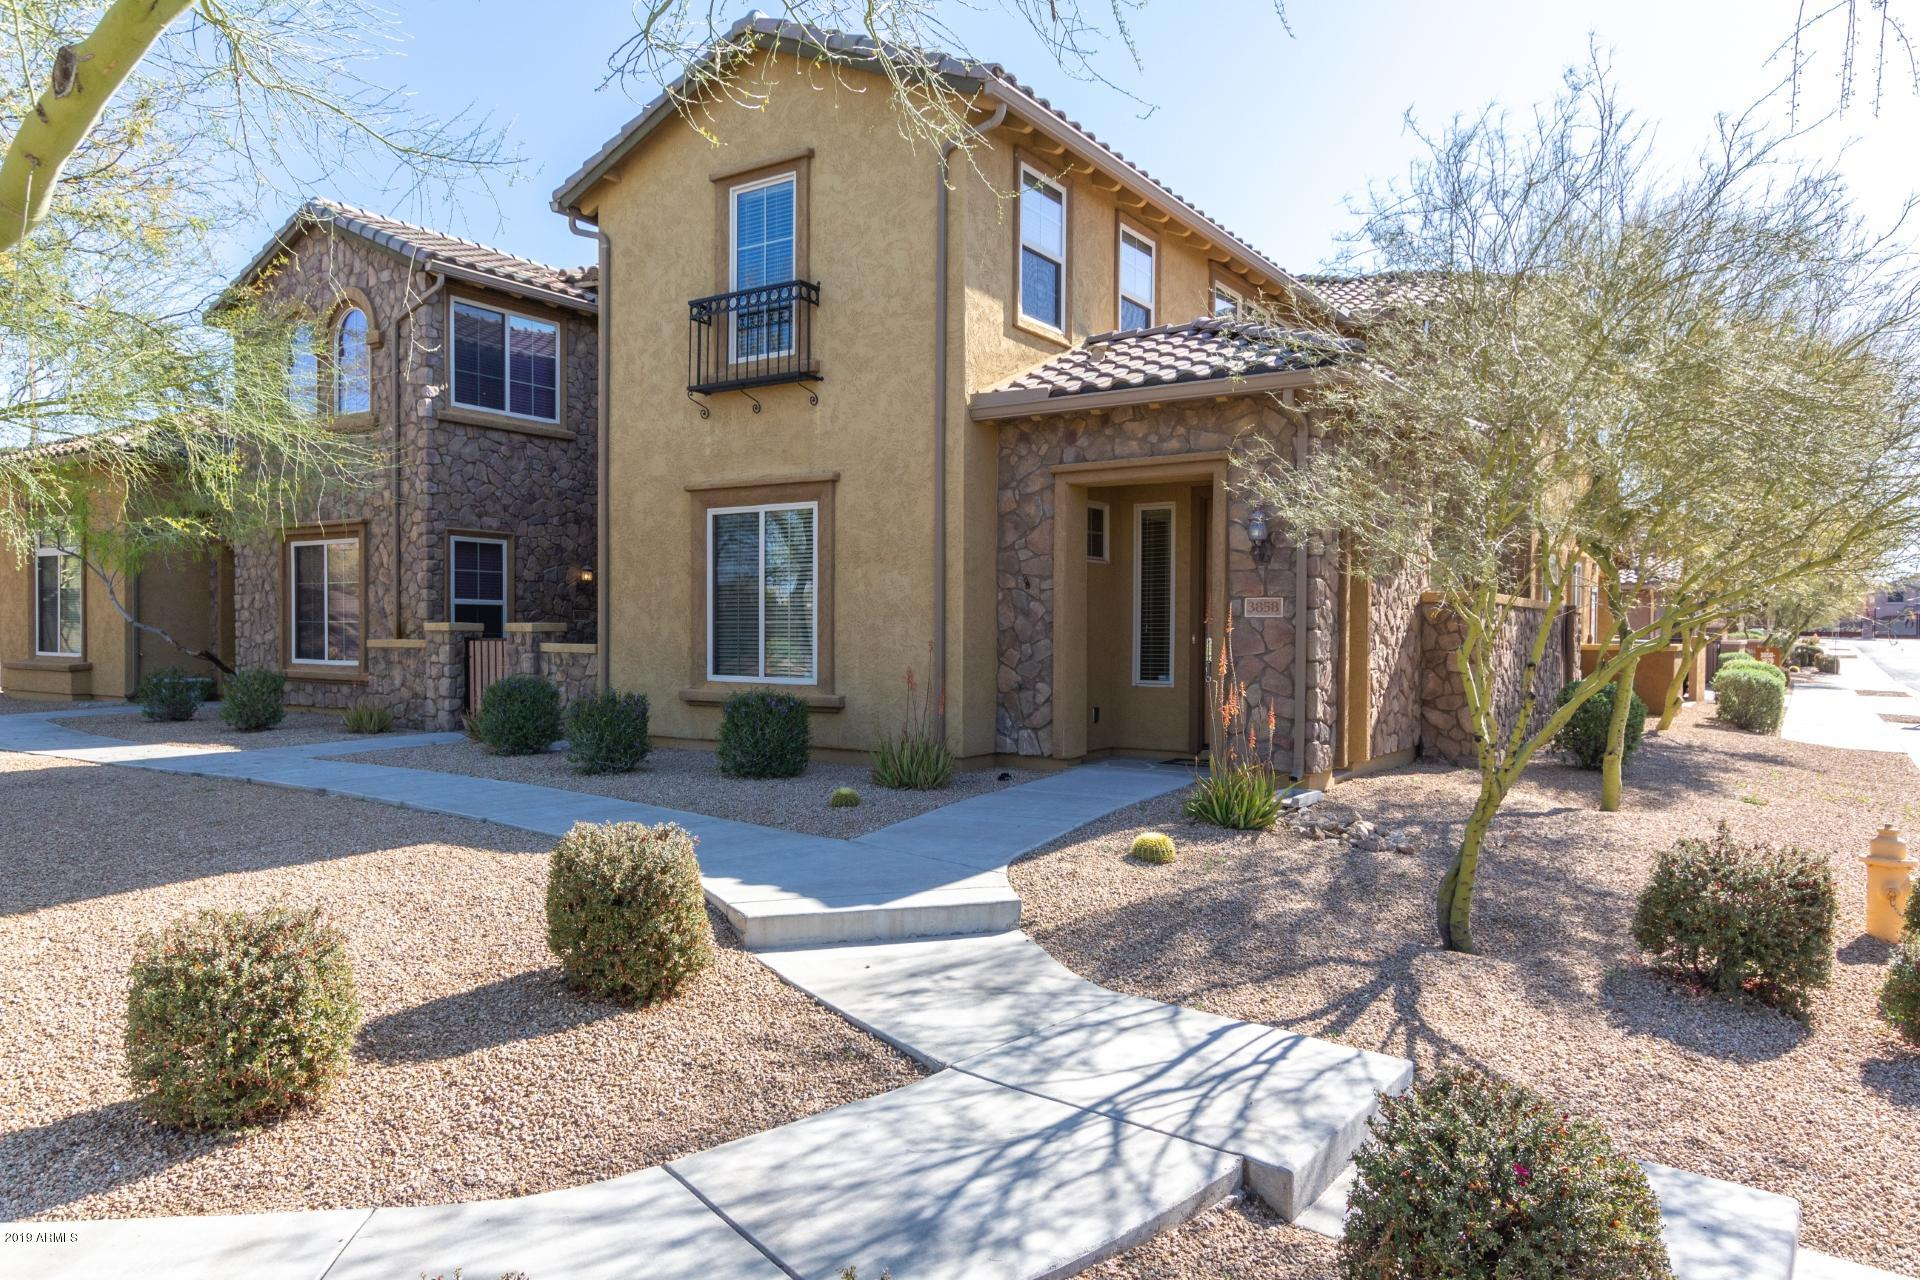 Photo for 3858 E Cat Balue Drive, Phoenix, AZ 85050 (MLS # 5906678)